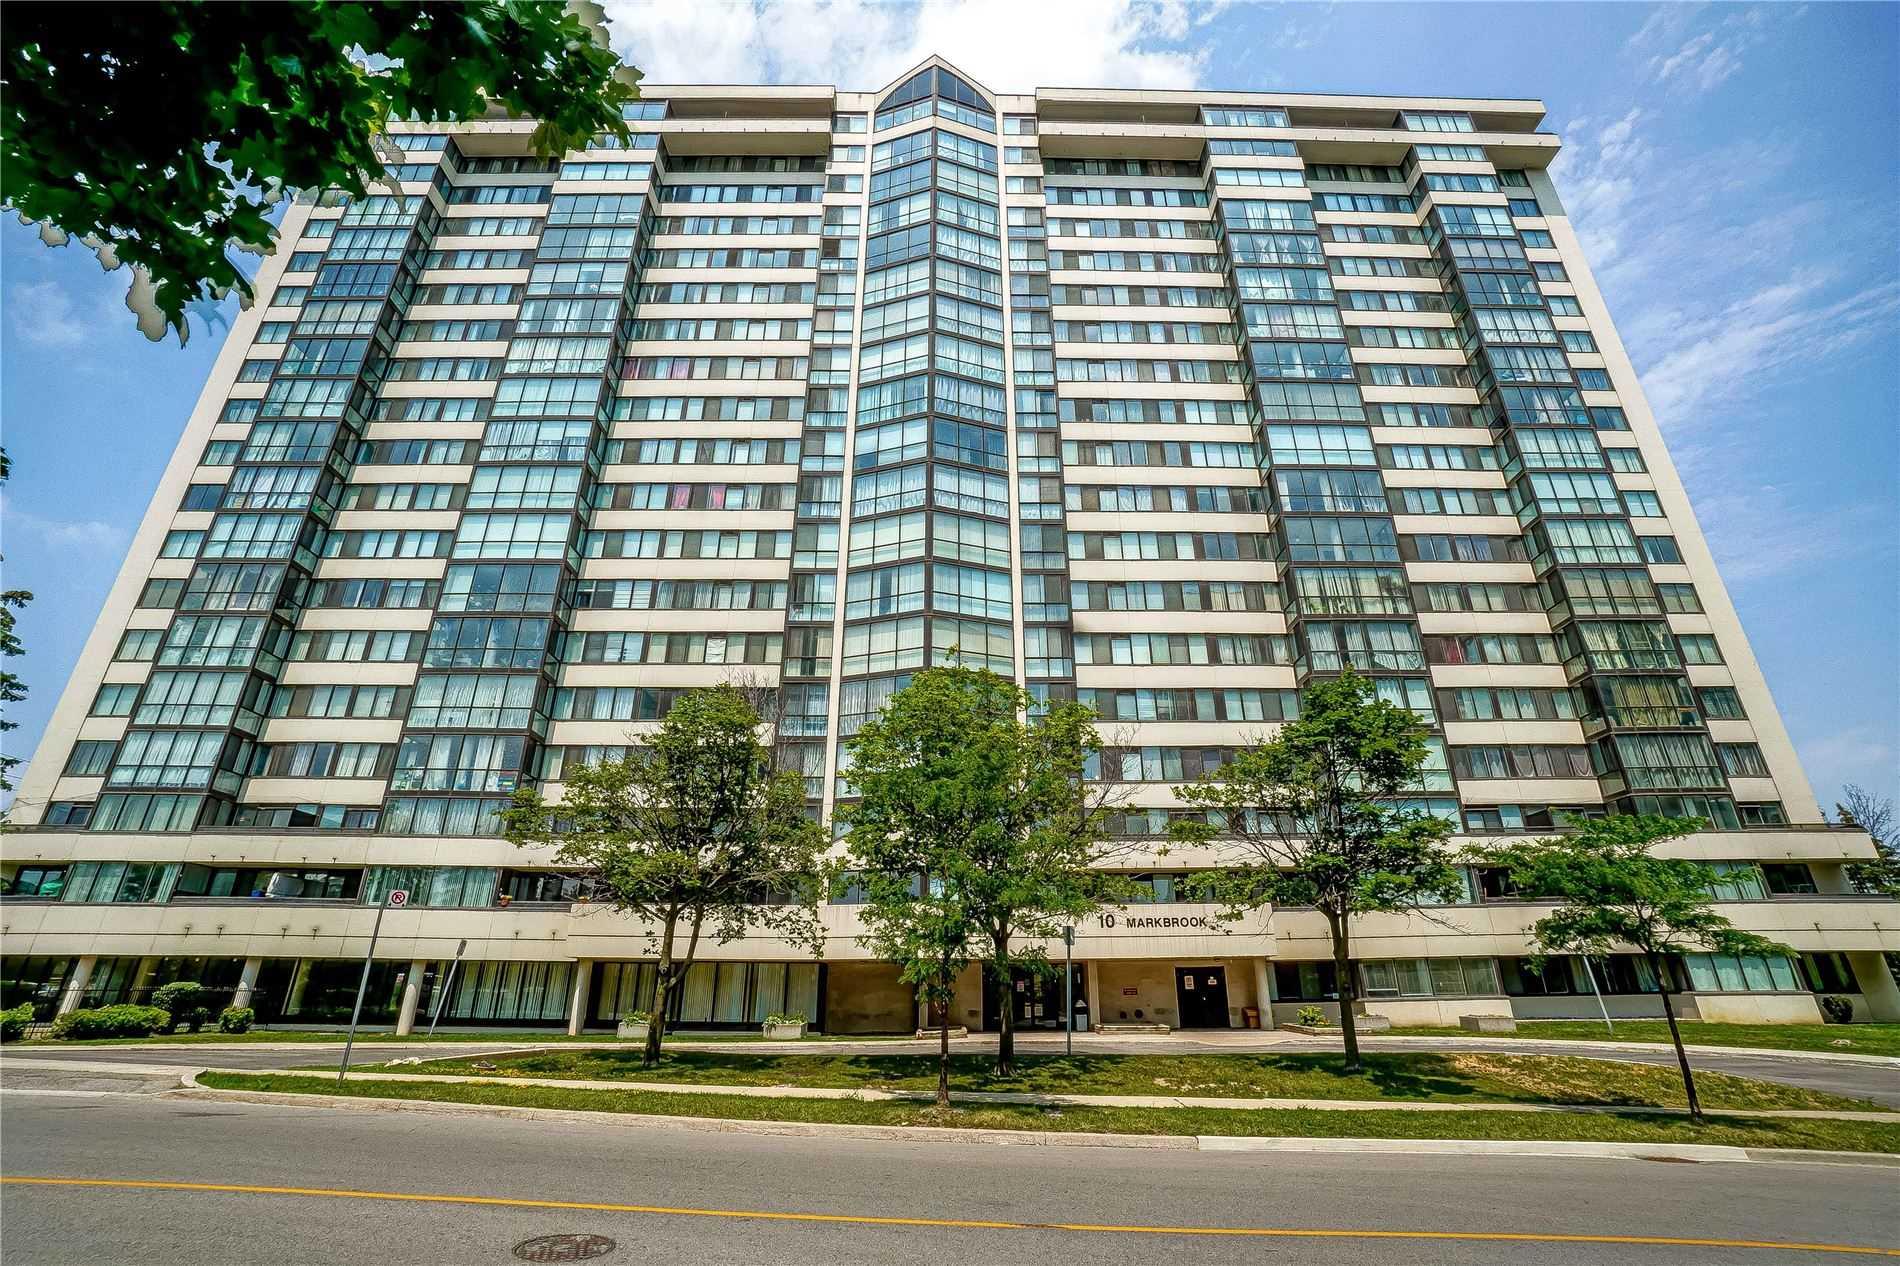 Condo Apt For Sale In Toronto , 2 Bedrooms Bedrooms, ,2 BathroomsBathrooms,Condo Apt,For Sale,1507,Markbrook